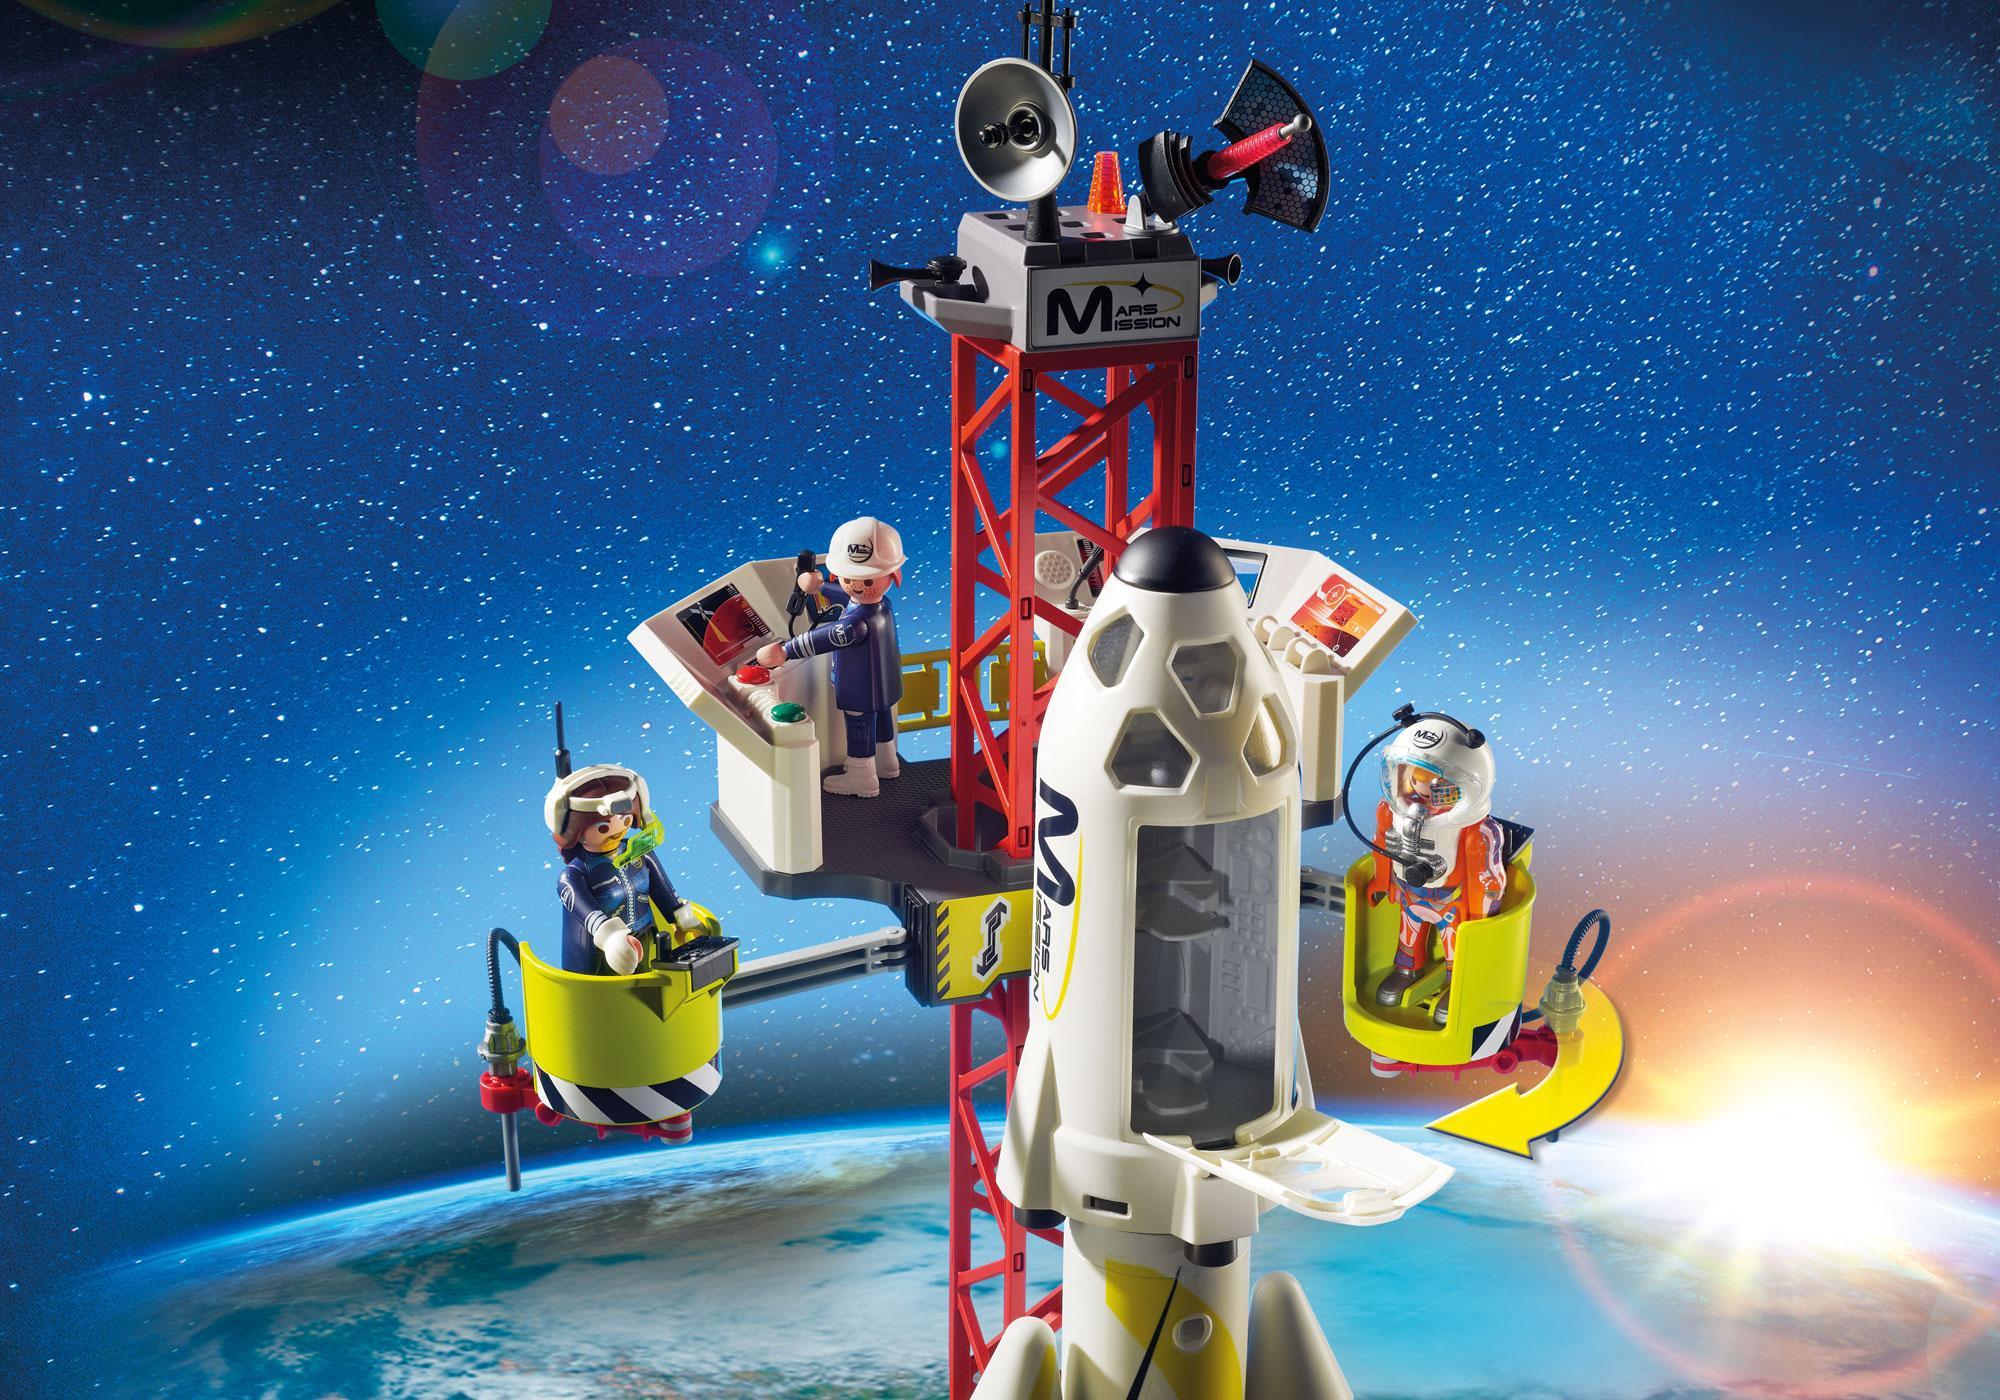 http://media.playmobil.com/i/playmobil/9488_product_extra1/Mars-raket met lanceerplatform